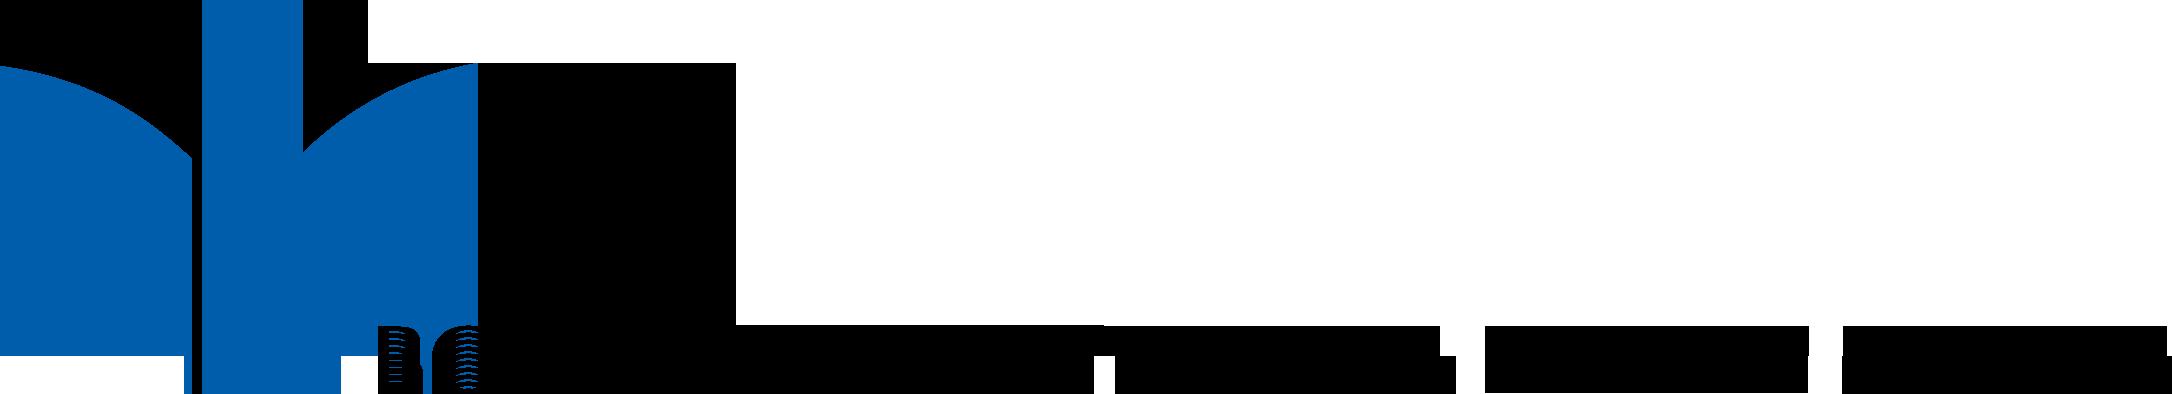 BSV-4-CMYK